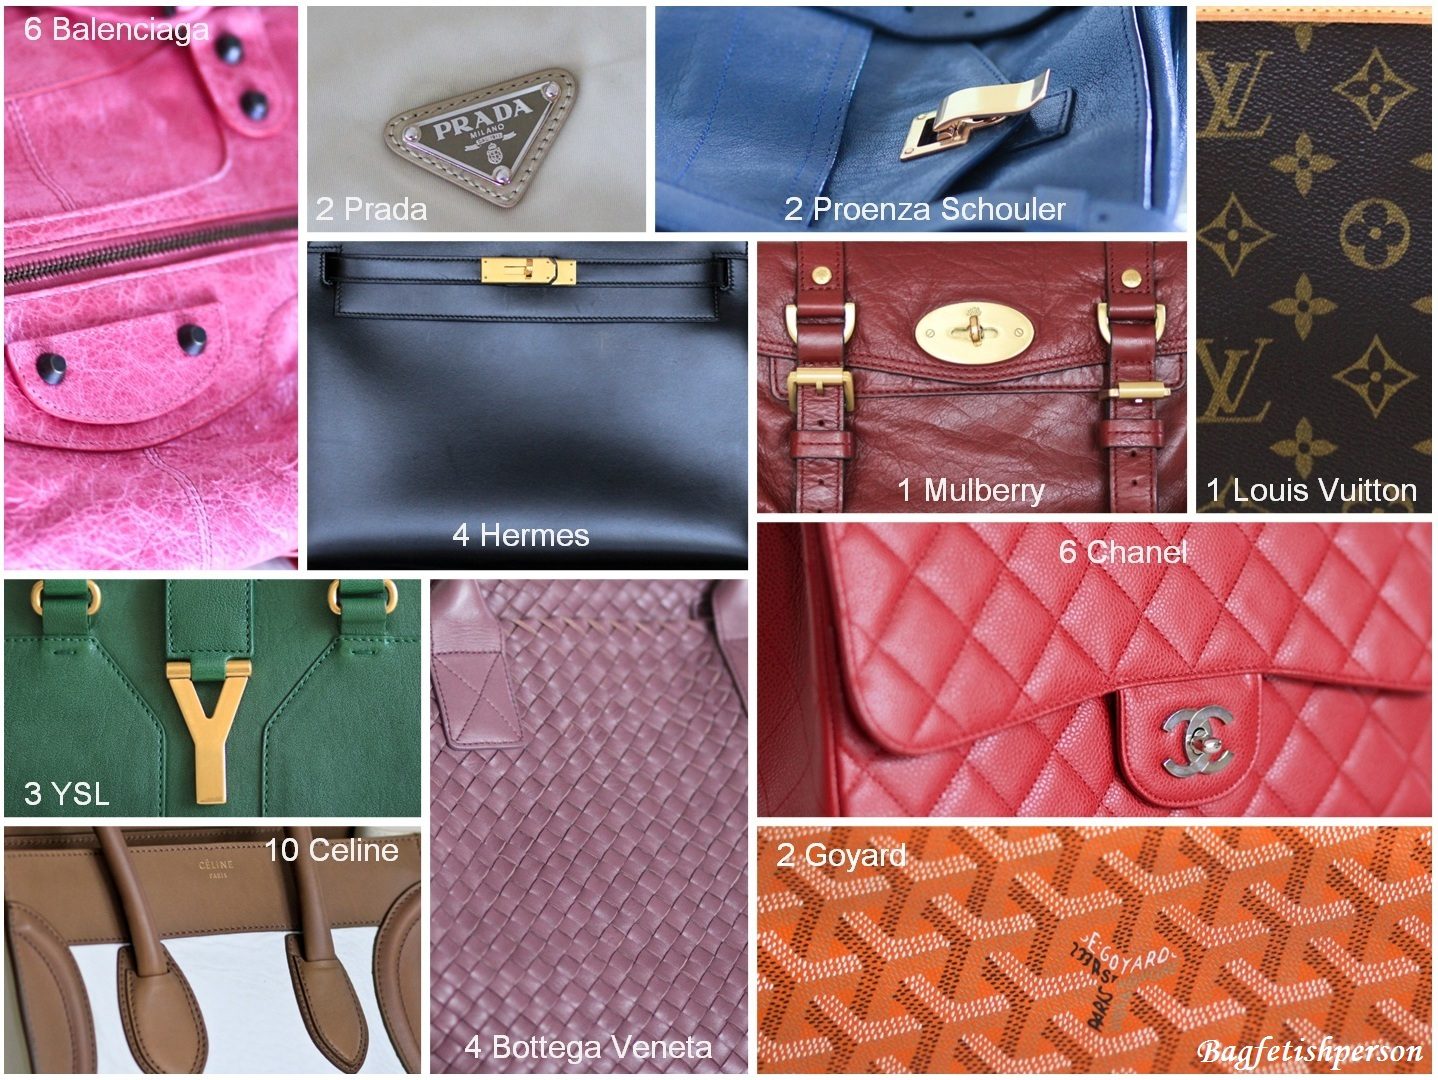 http://2.bp.blogspot.com/-2CVxOAYK6CA/UN4r6SEderI/AAAAAAAAGEE/vrtTQHXNb4Y/s1600/Bag+inventory+collage+2012+b.jpg